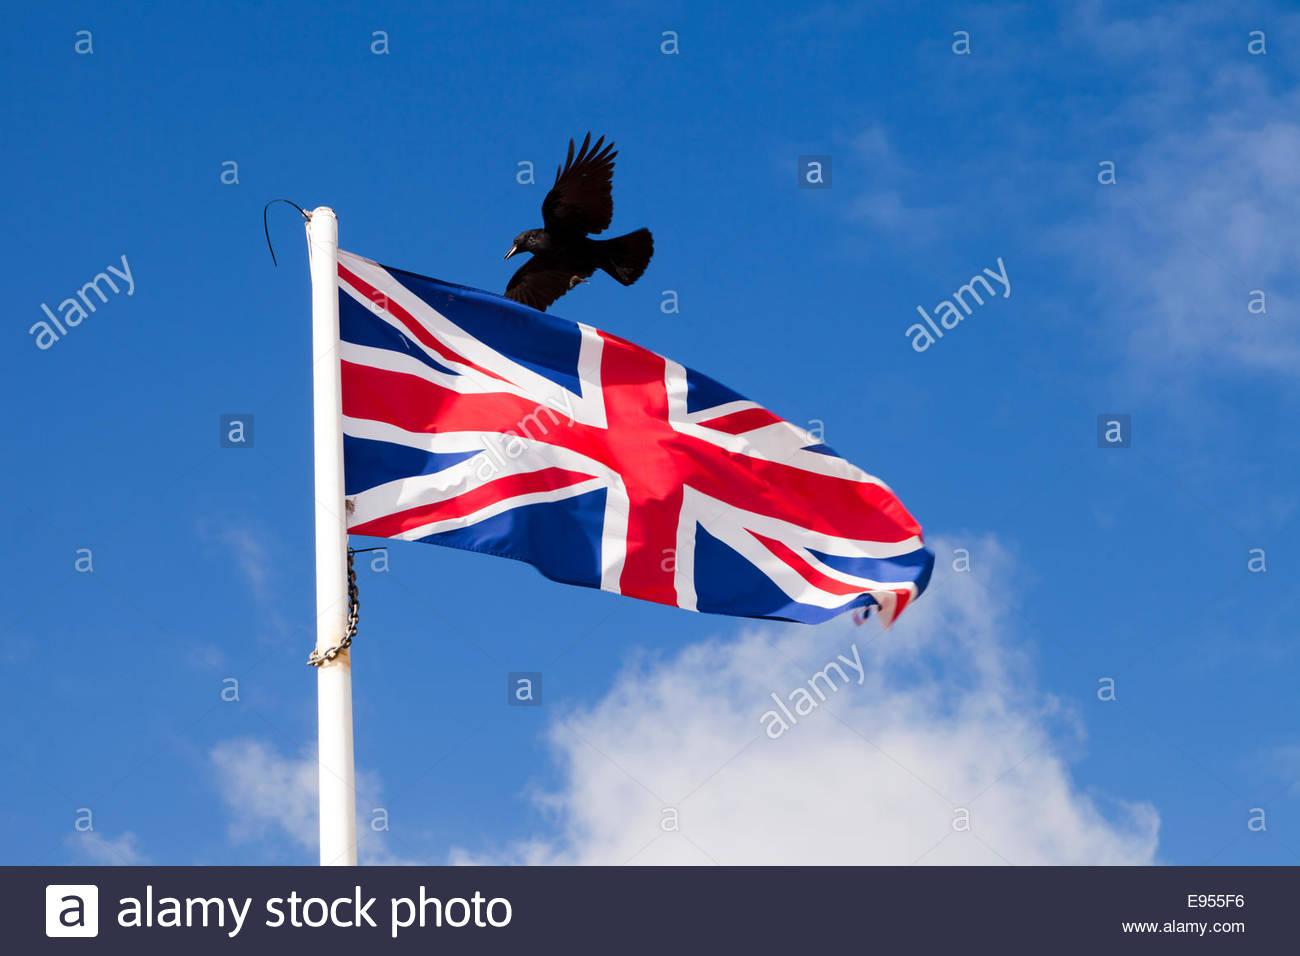 Eine Nebelkrähe fliegen über flattern Union Jack Flagge, Konzept dunkle finstere Bedrohung, gegen den Stockbild